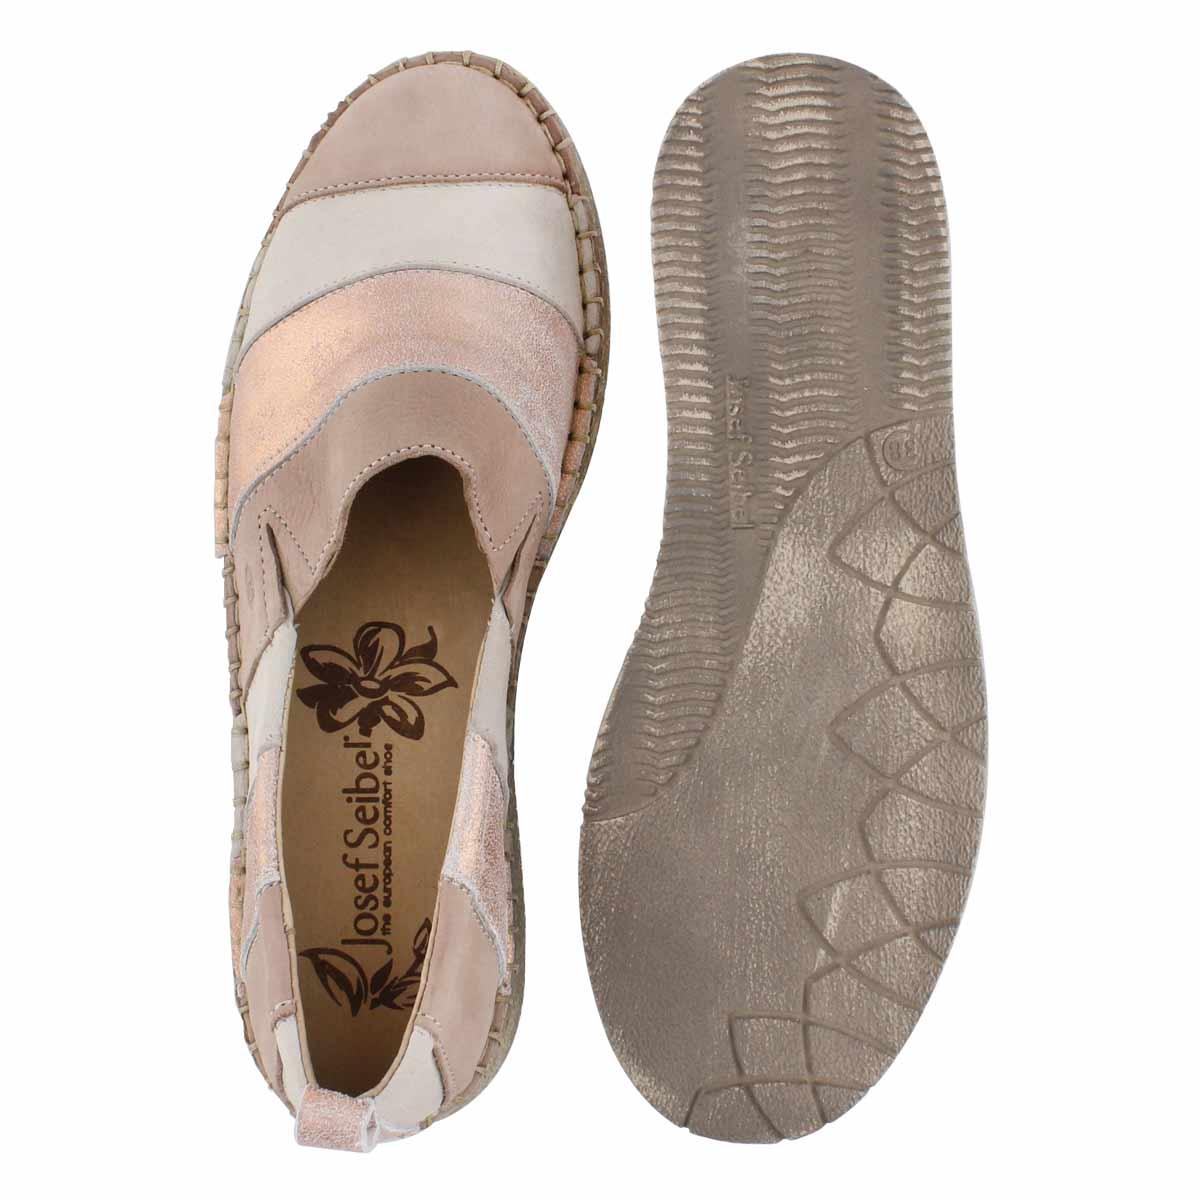 Lds Sofie 23 nude mlti slip on shoe